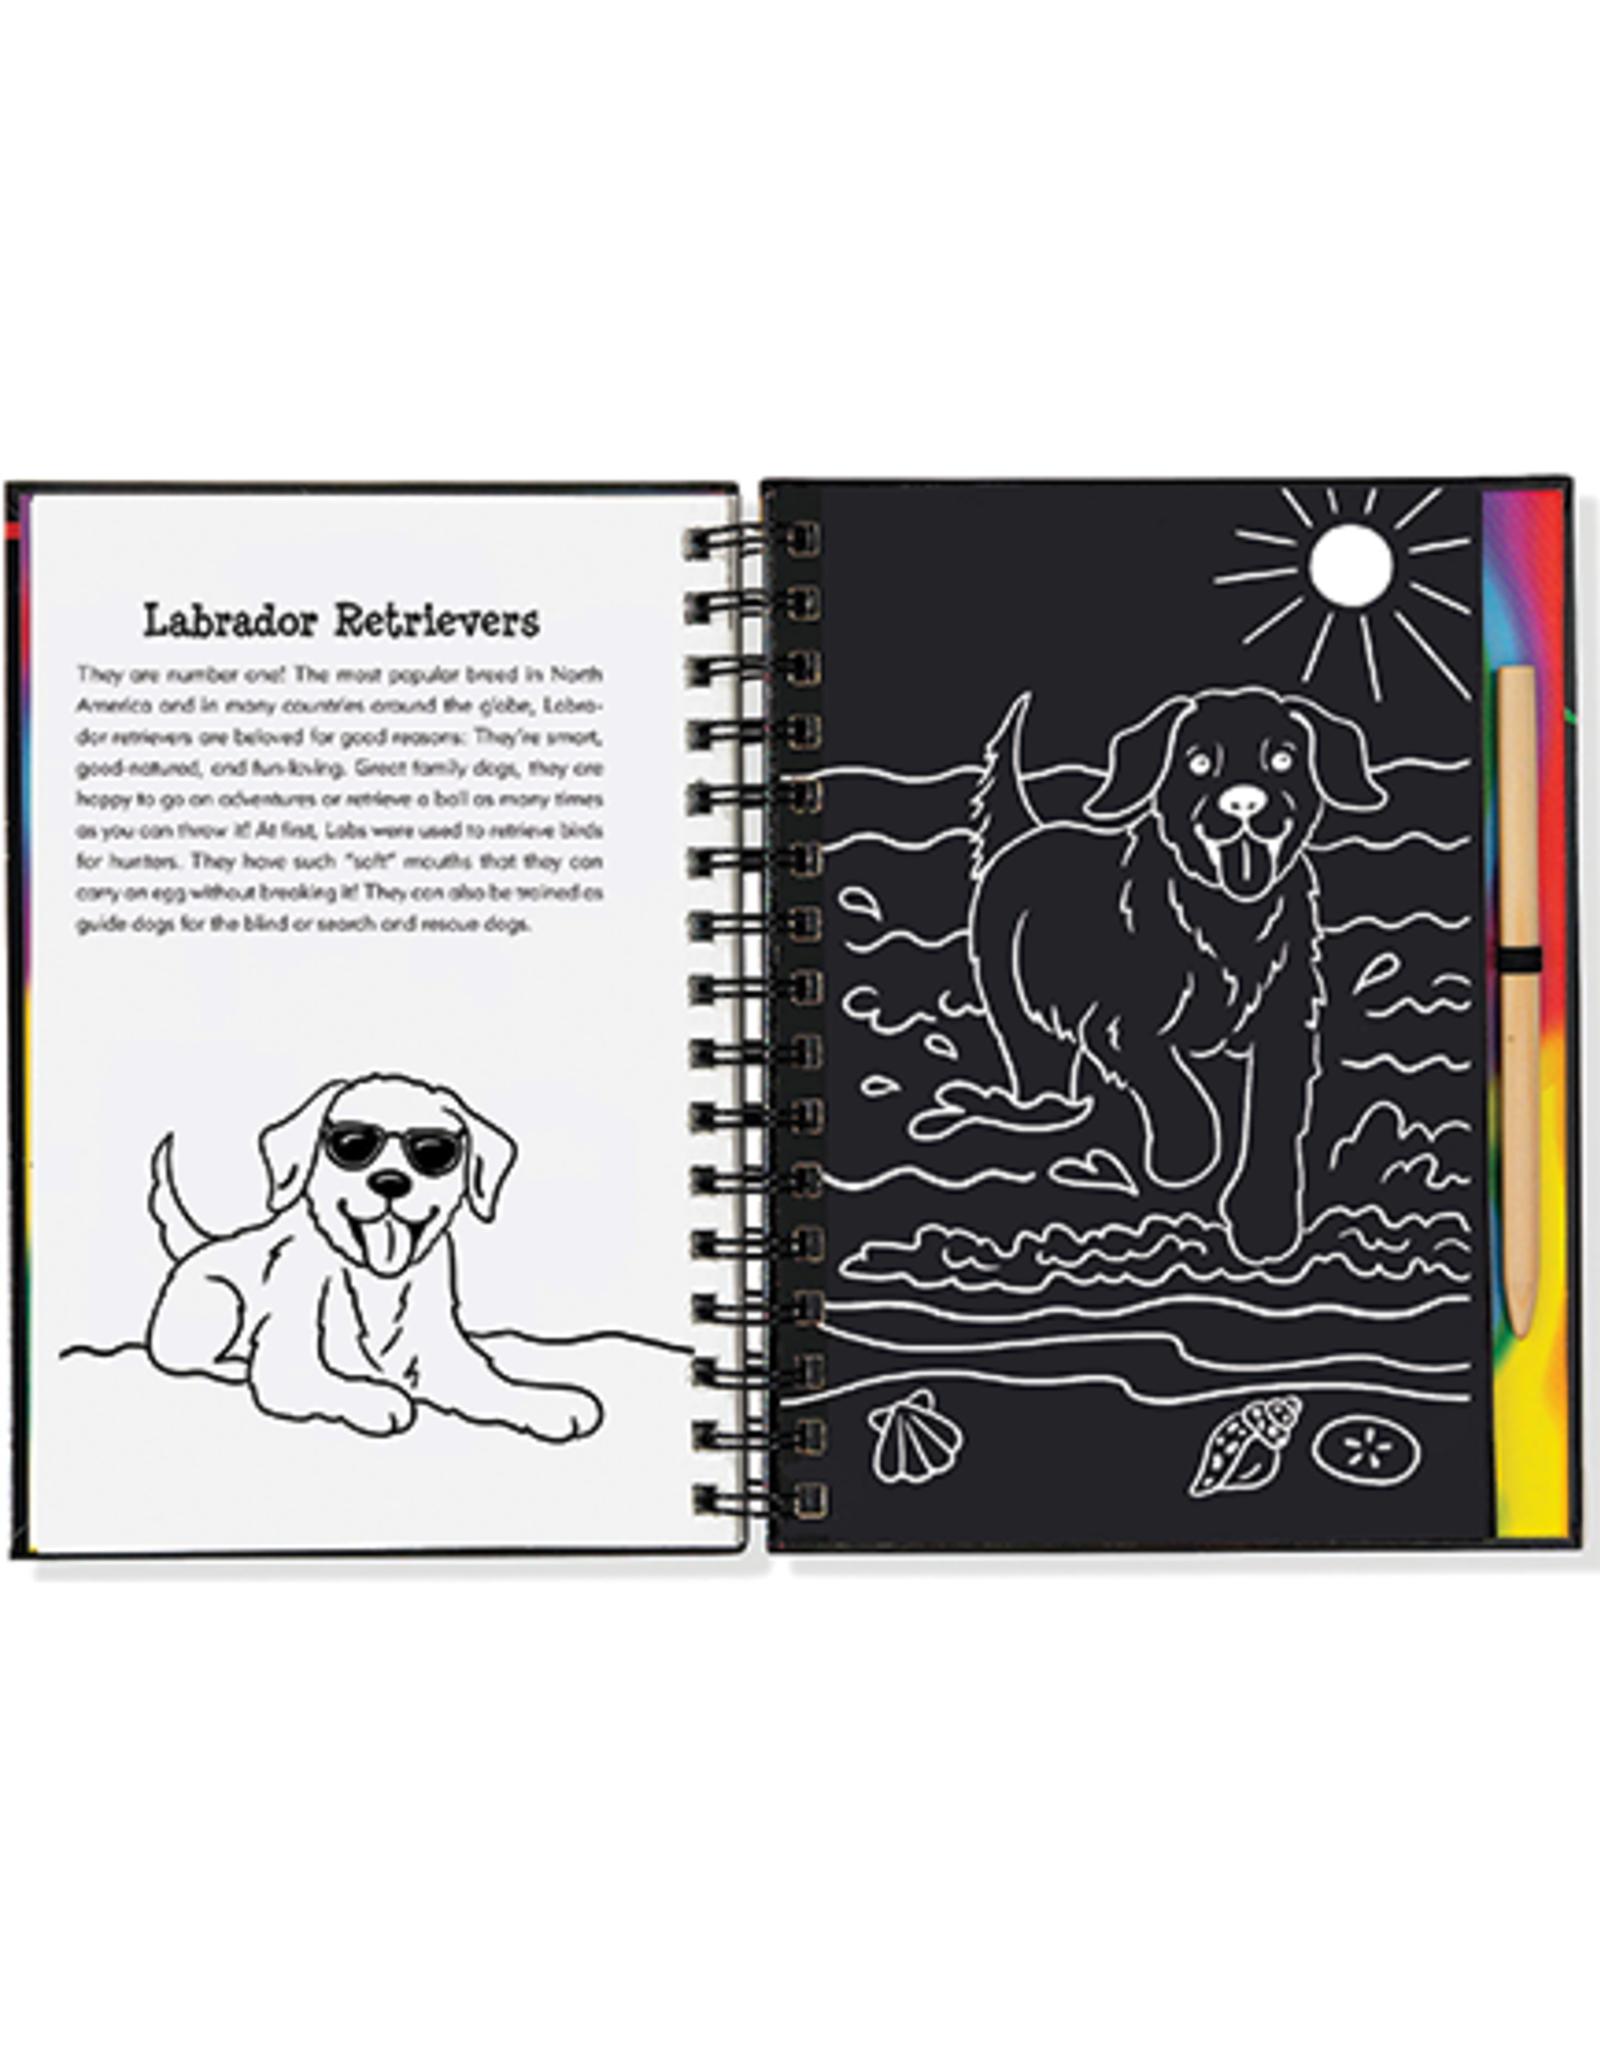 Puppies Scratch & Sketch Art Activity Book